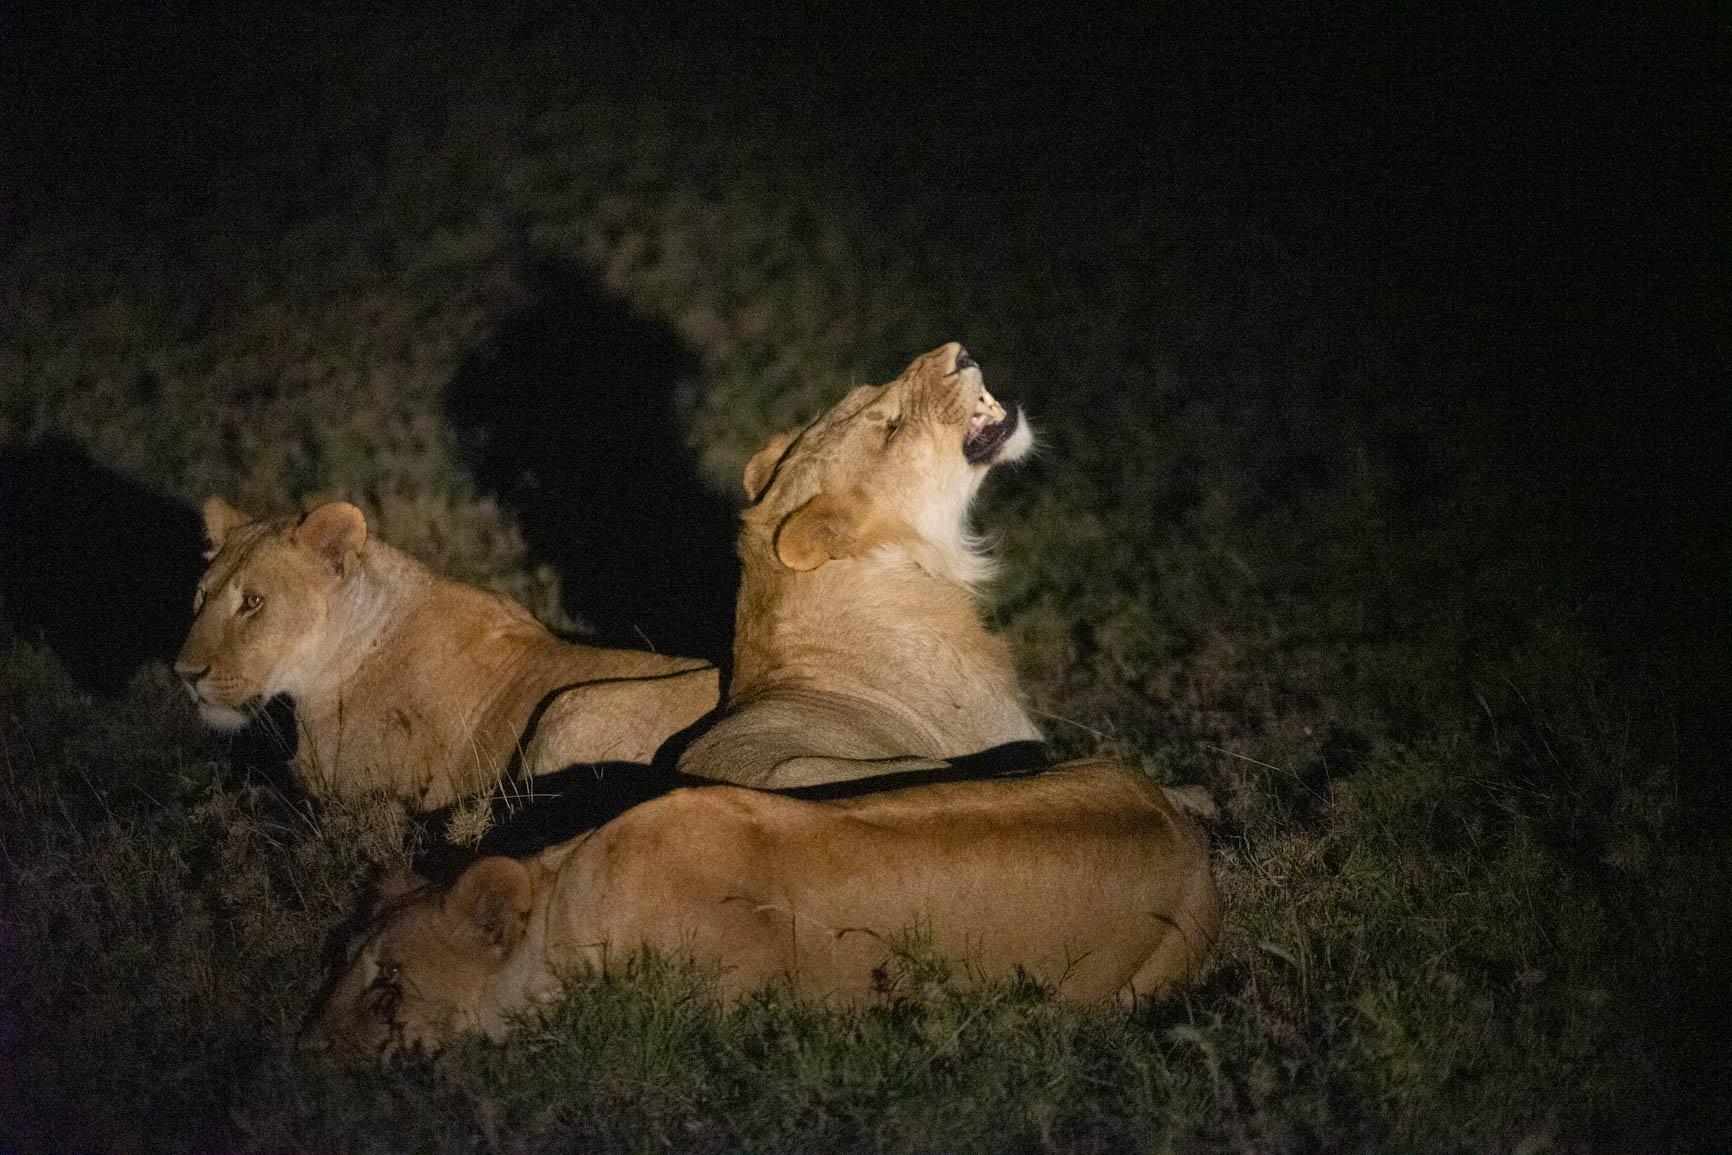 Kenya wildlife safari night game